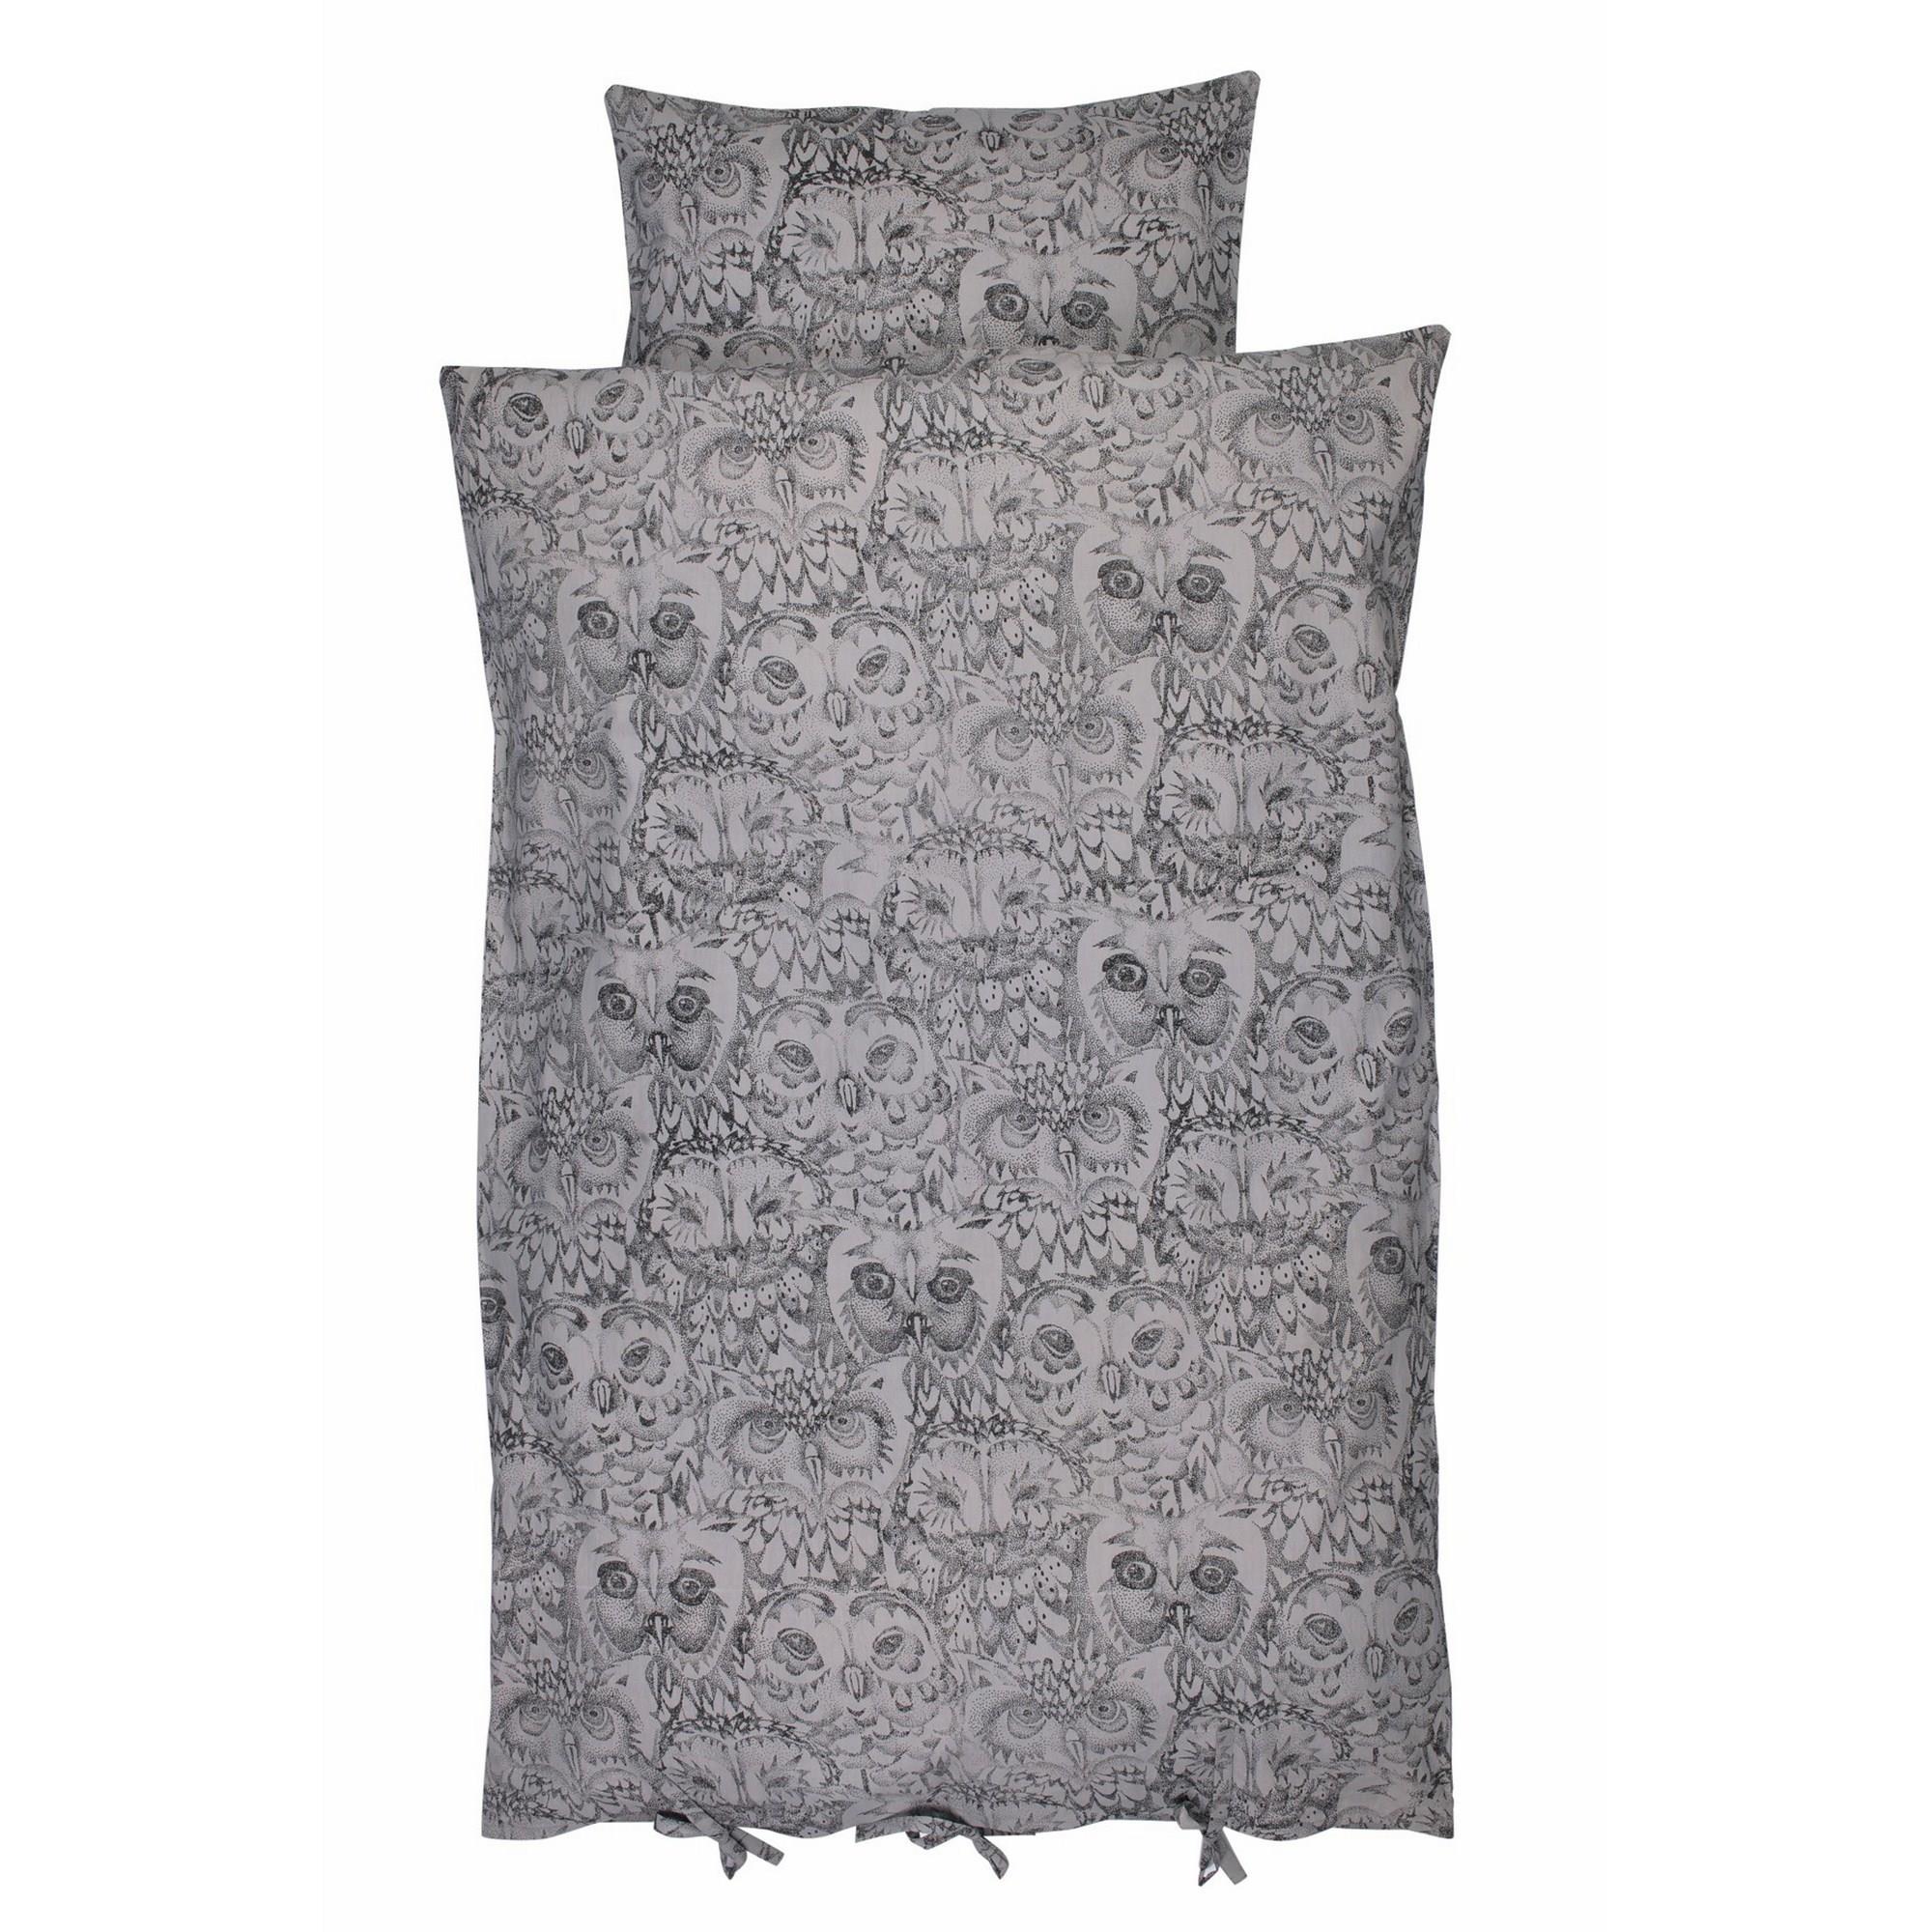 soft gallery sengetøj Soft Gallery Owl Bed Linen (drizzle) soft gallery sengetøj